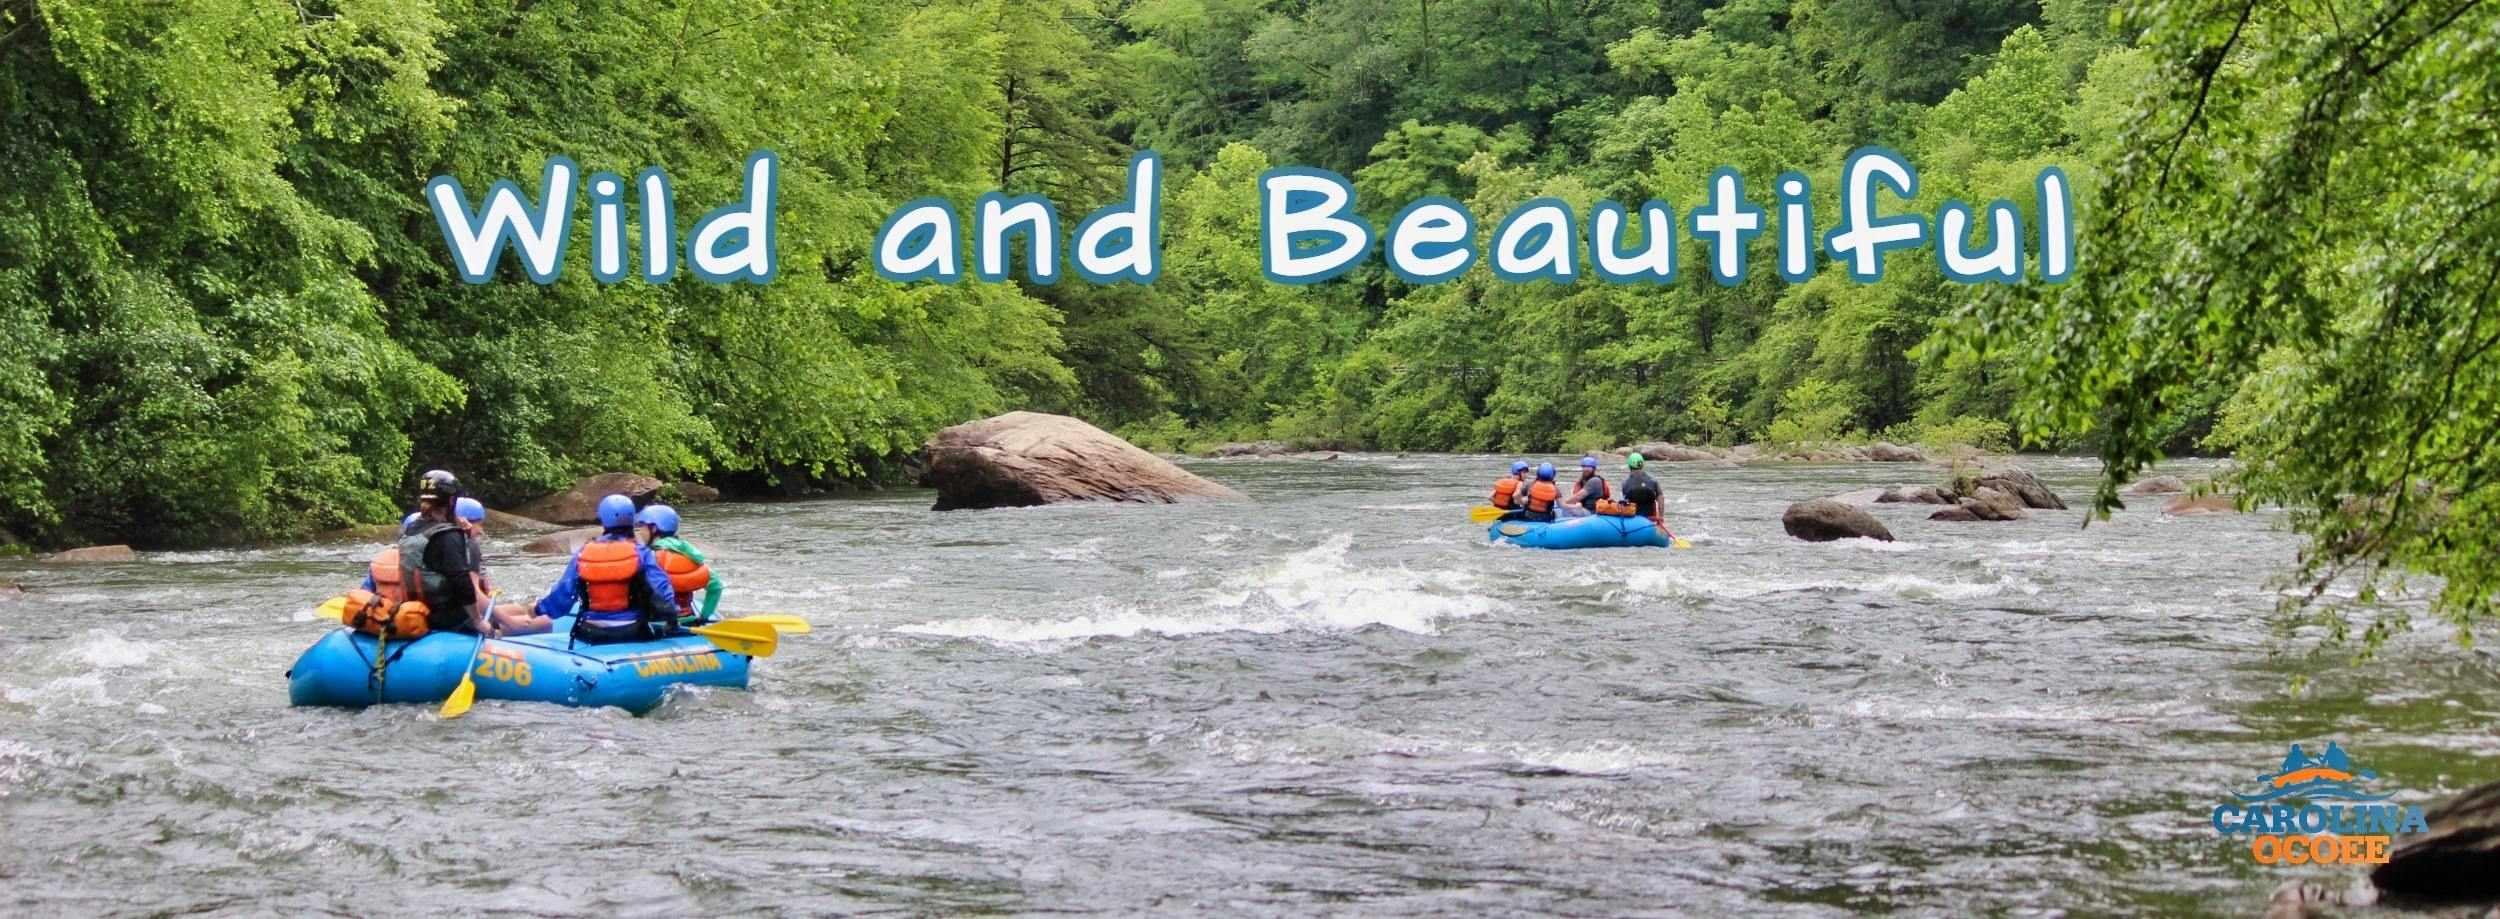 Ocoee River Rafting Wild